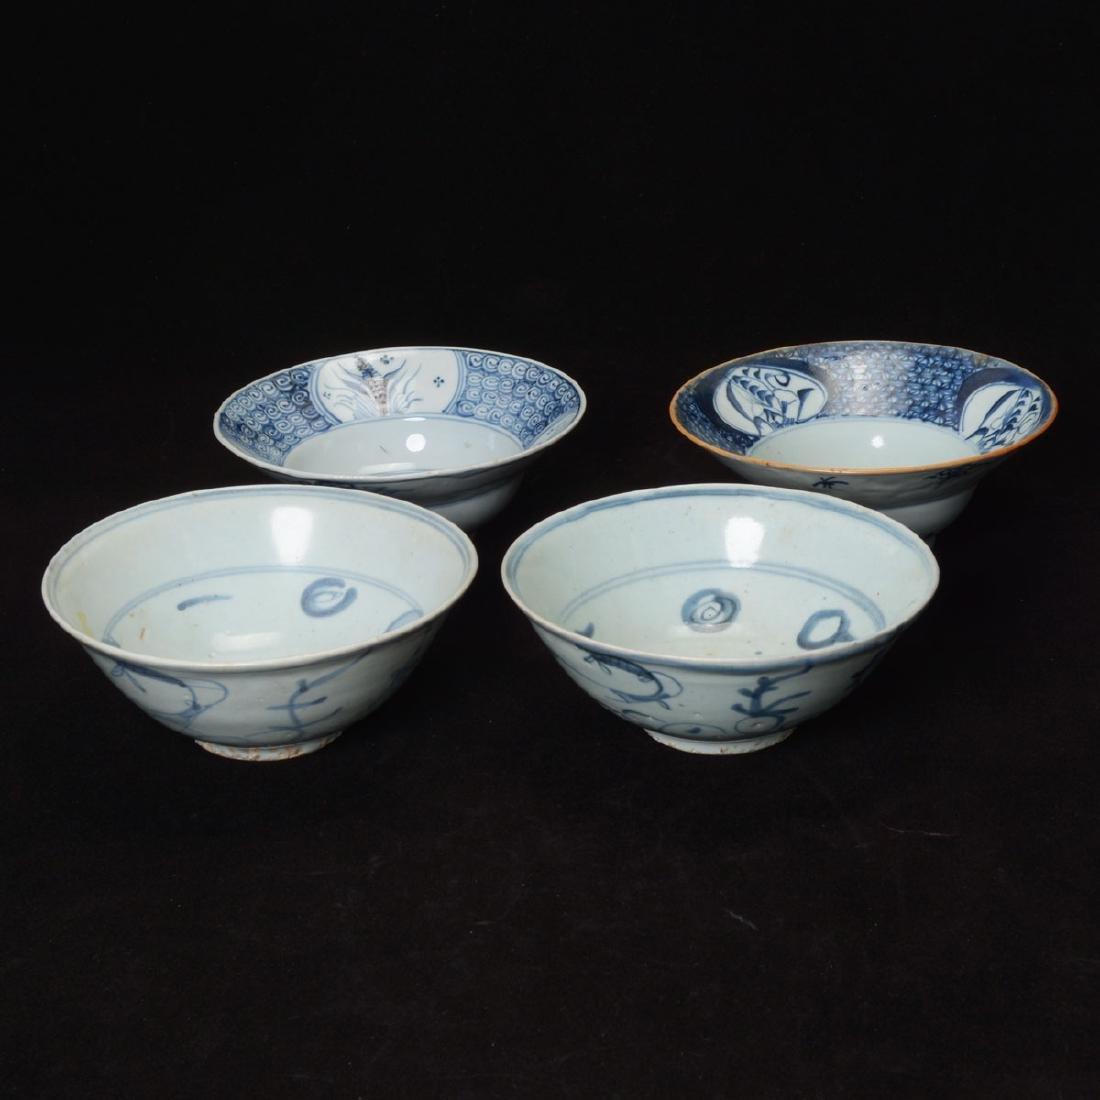 Four Underglaze Blue Bowls, 17th Century